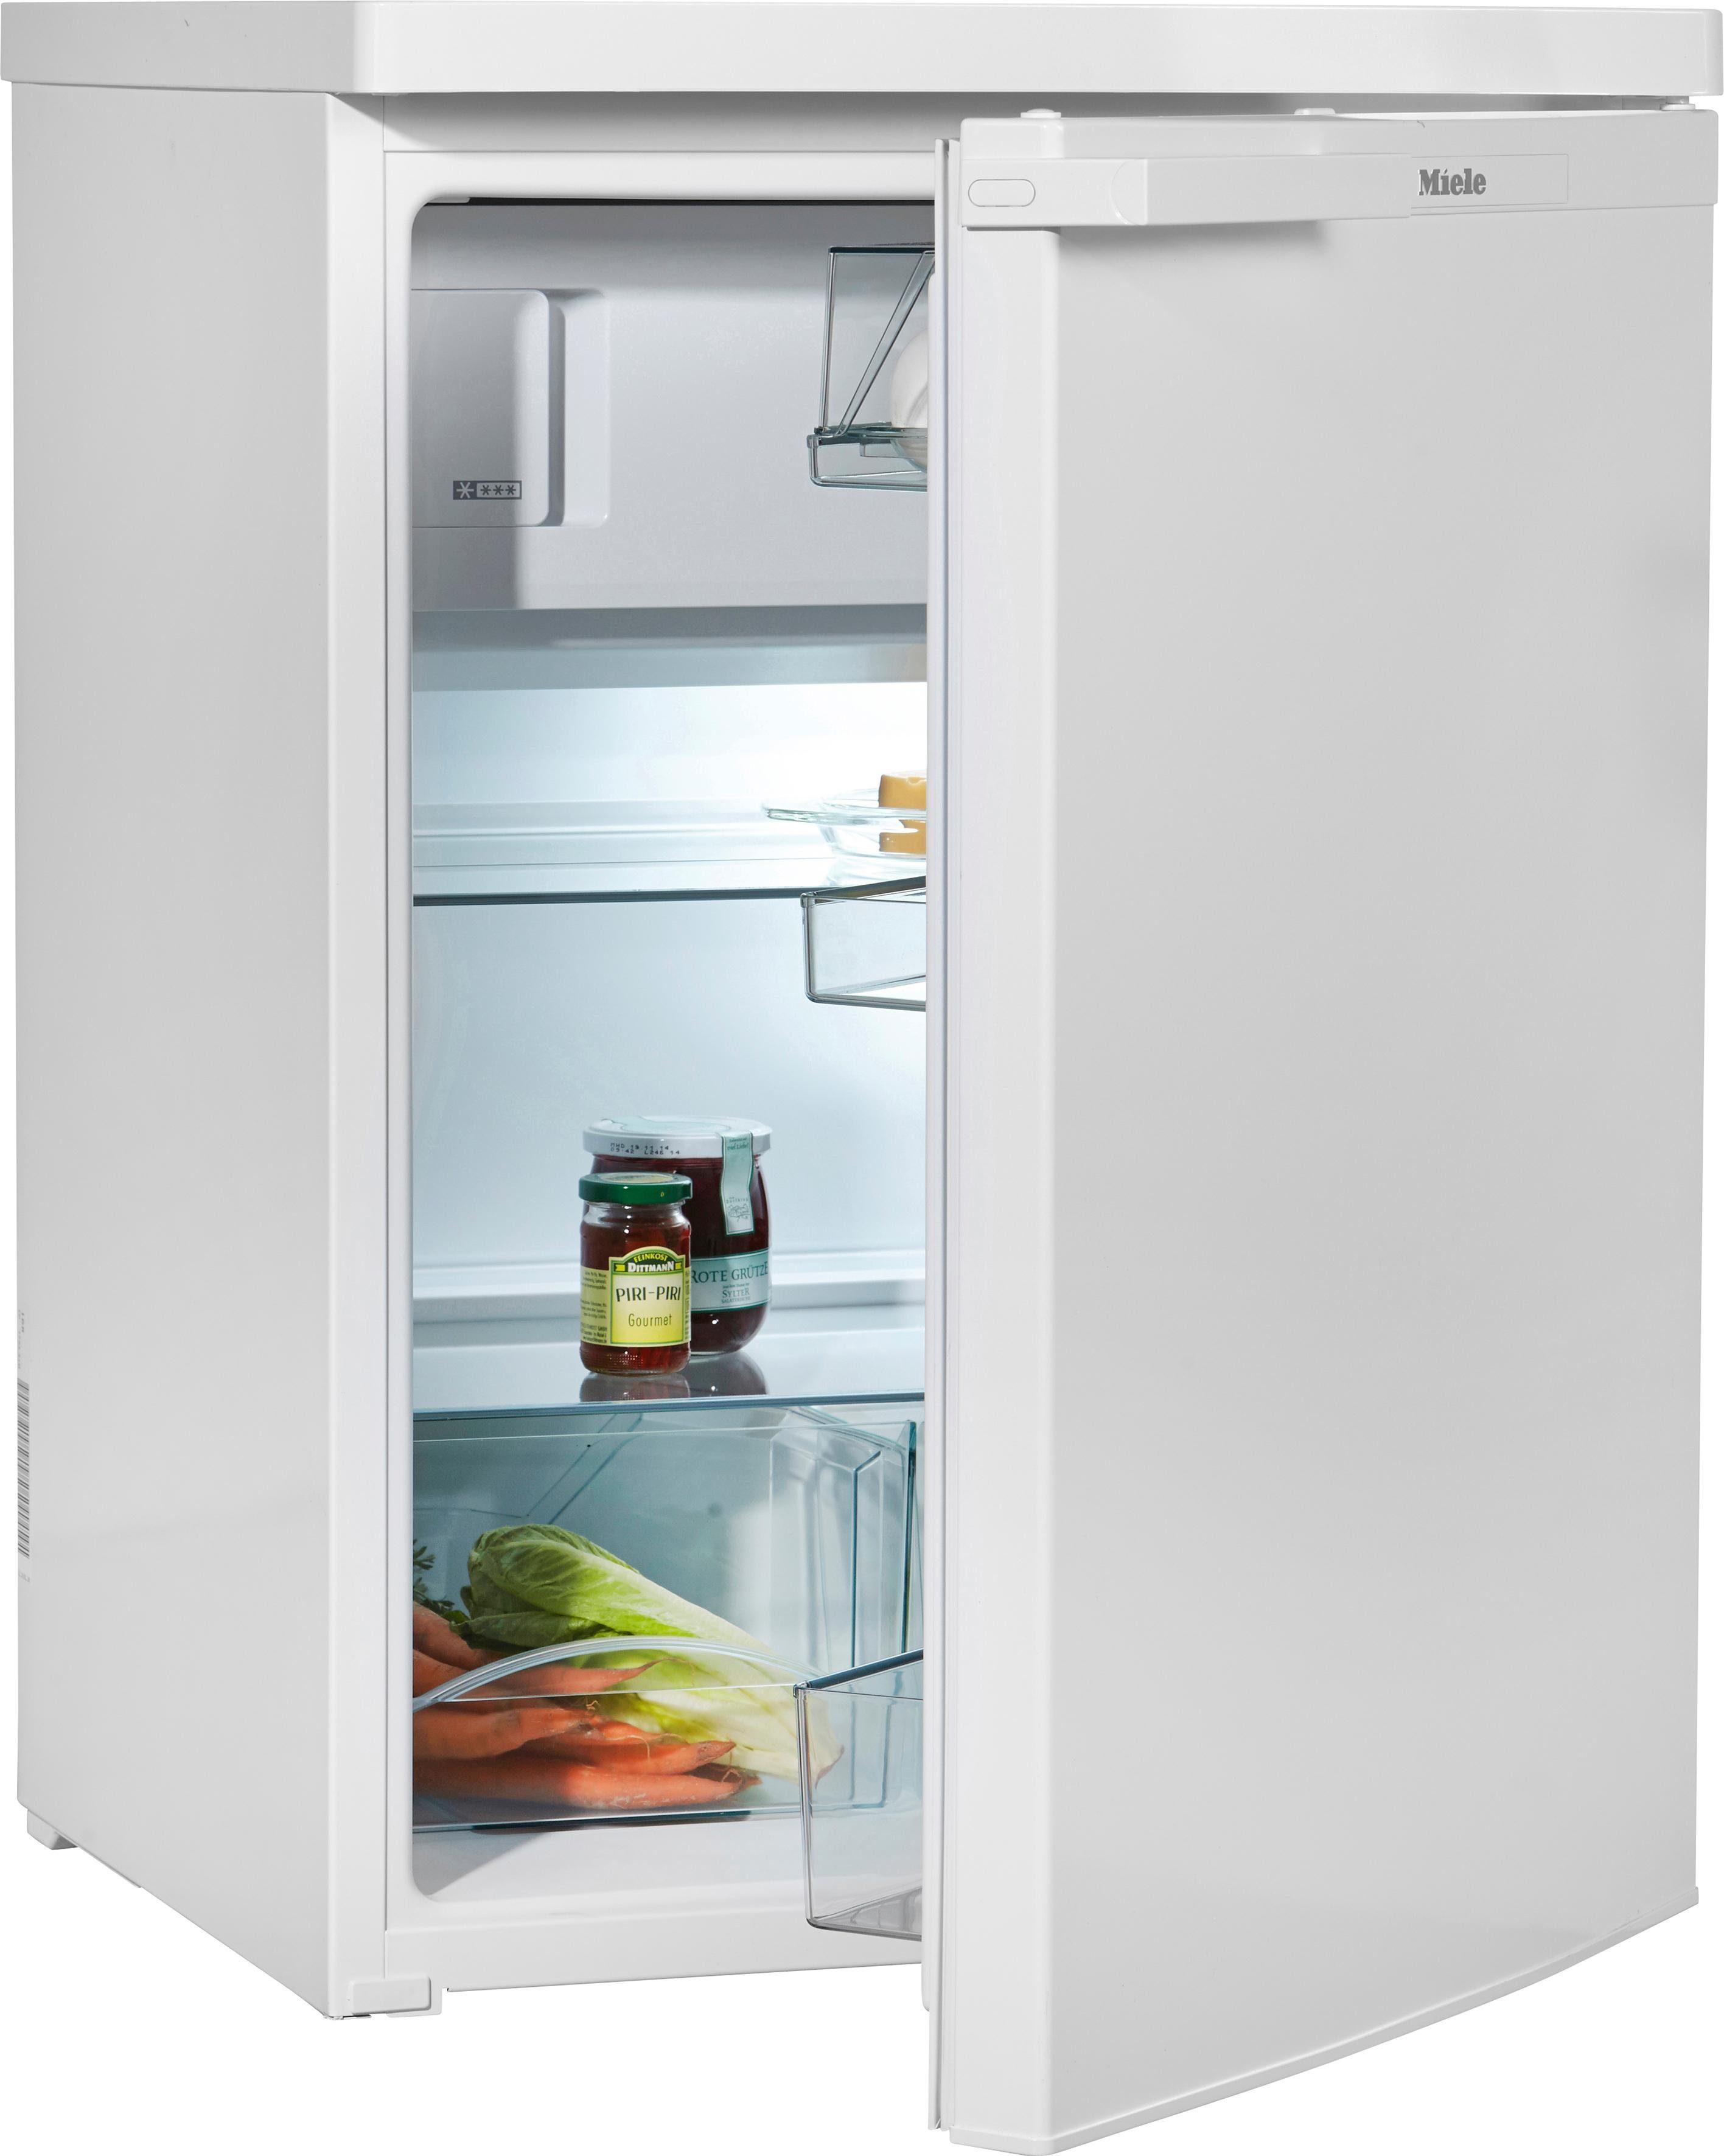 Miele Stand-Kühlschrank K 12024 S-3, A+++, 85 cm